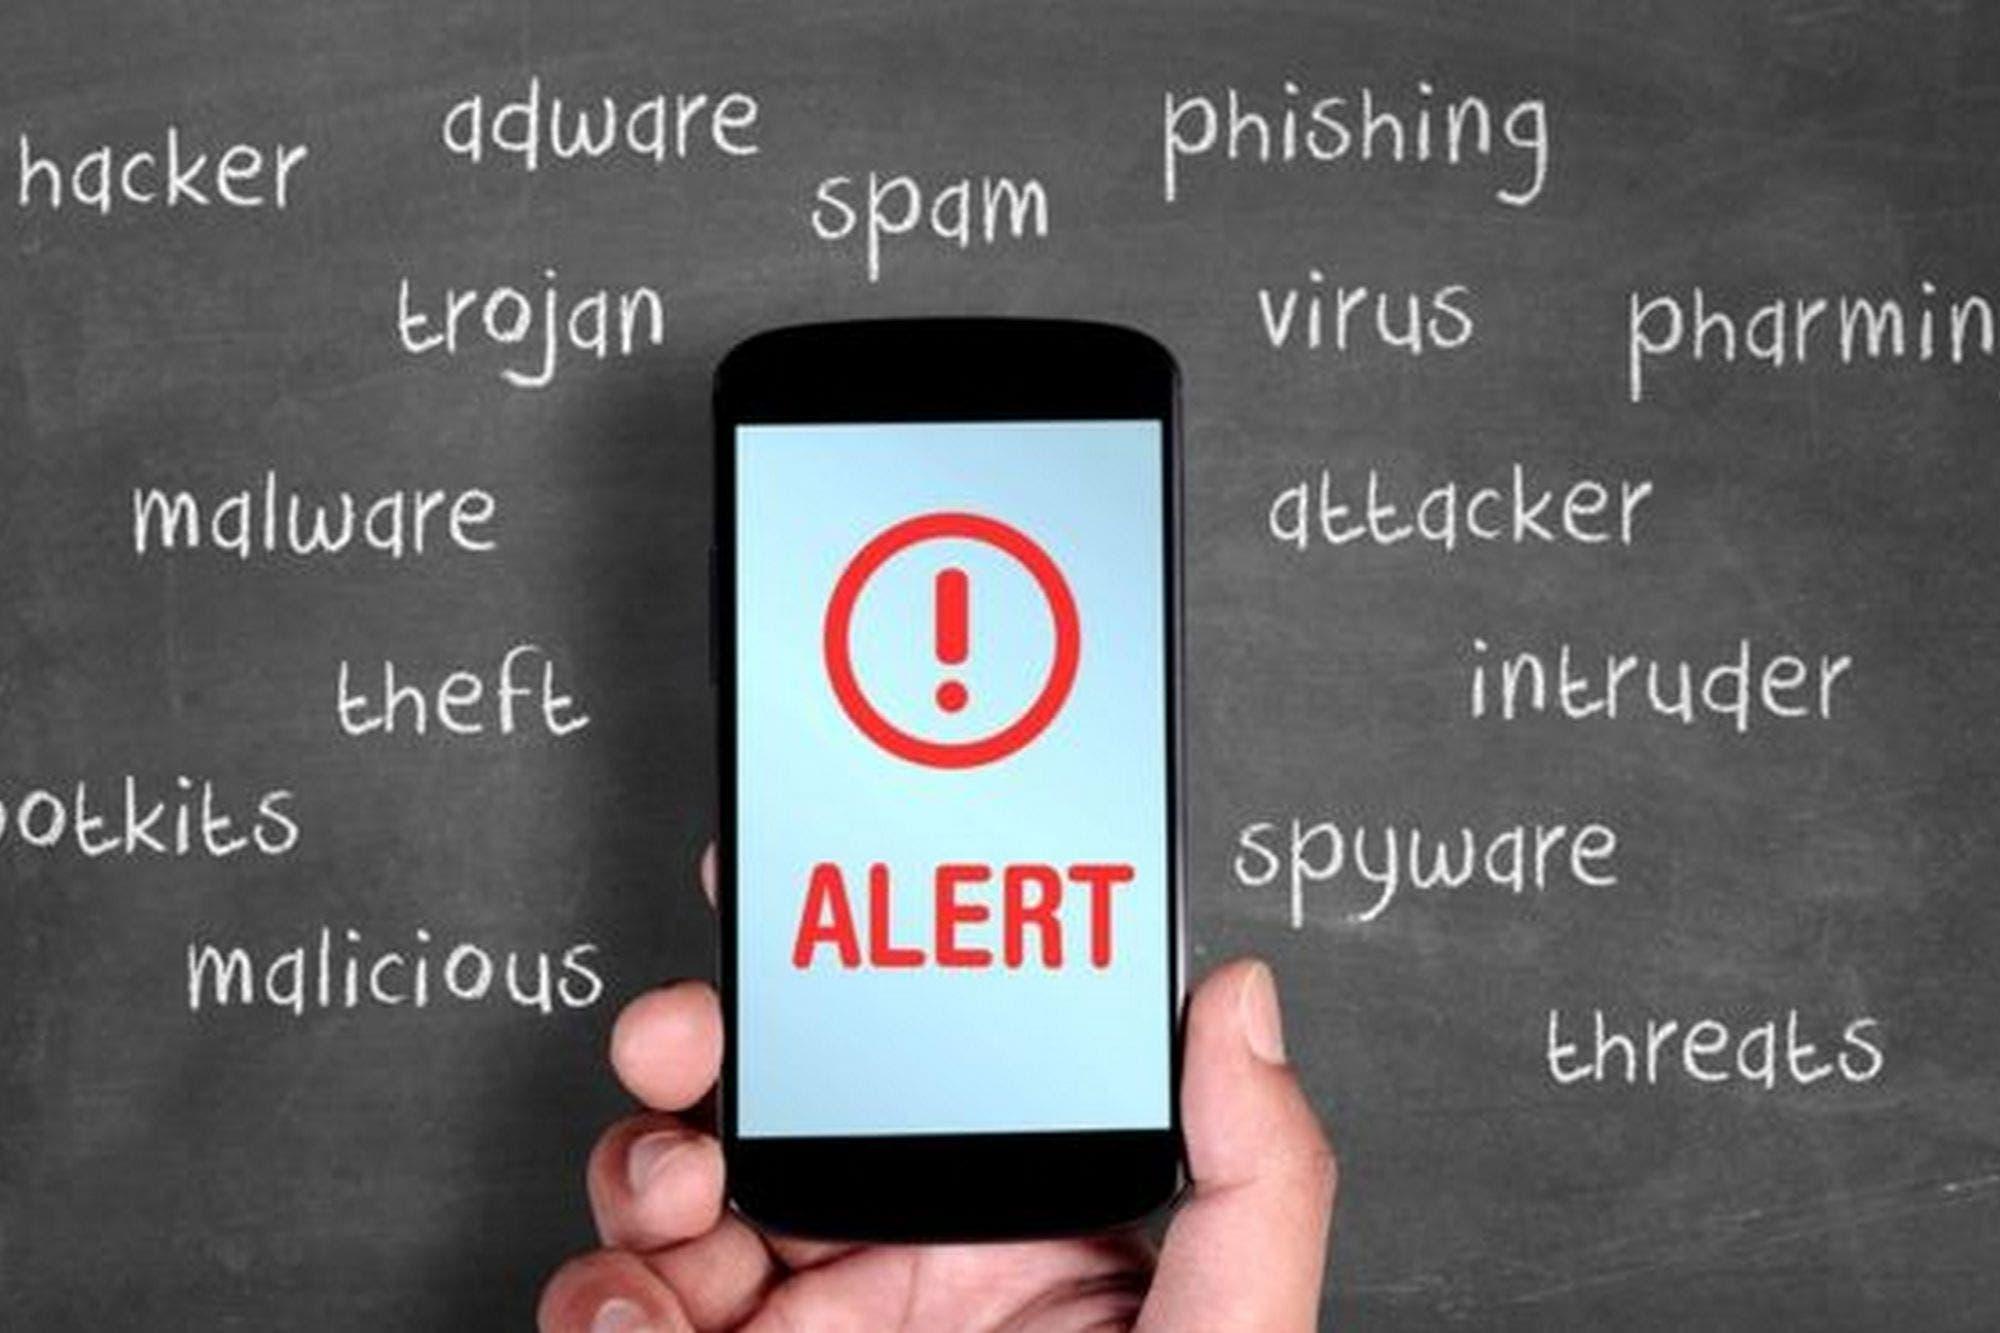 El virus Joker volvió a infectar aplicaciones de Android: ¿cuáles son?